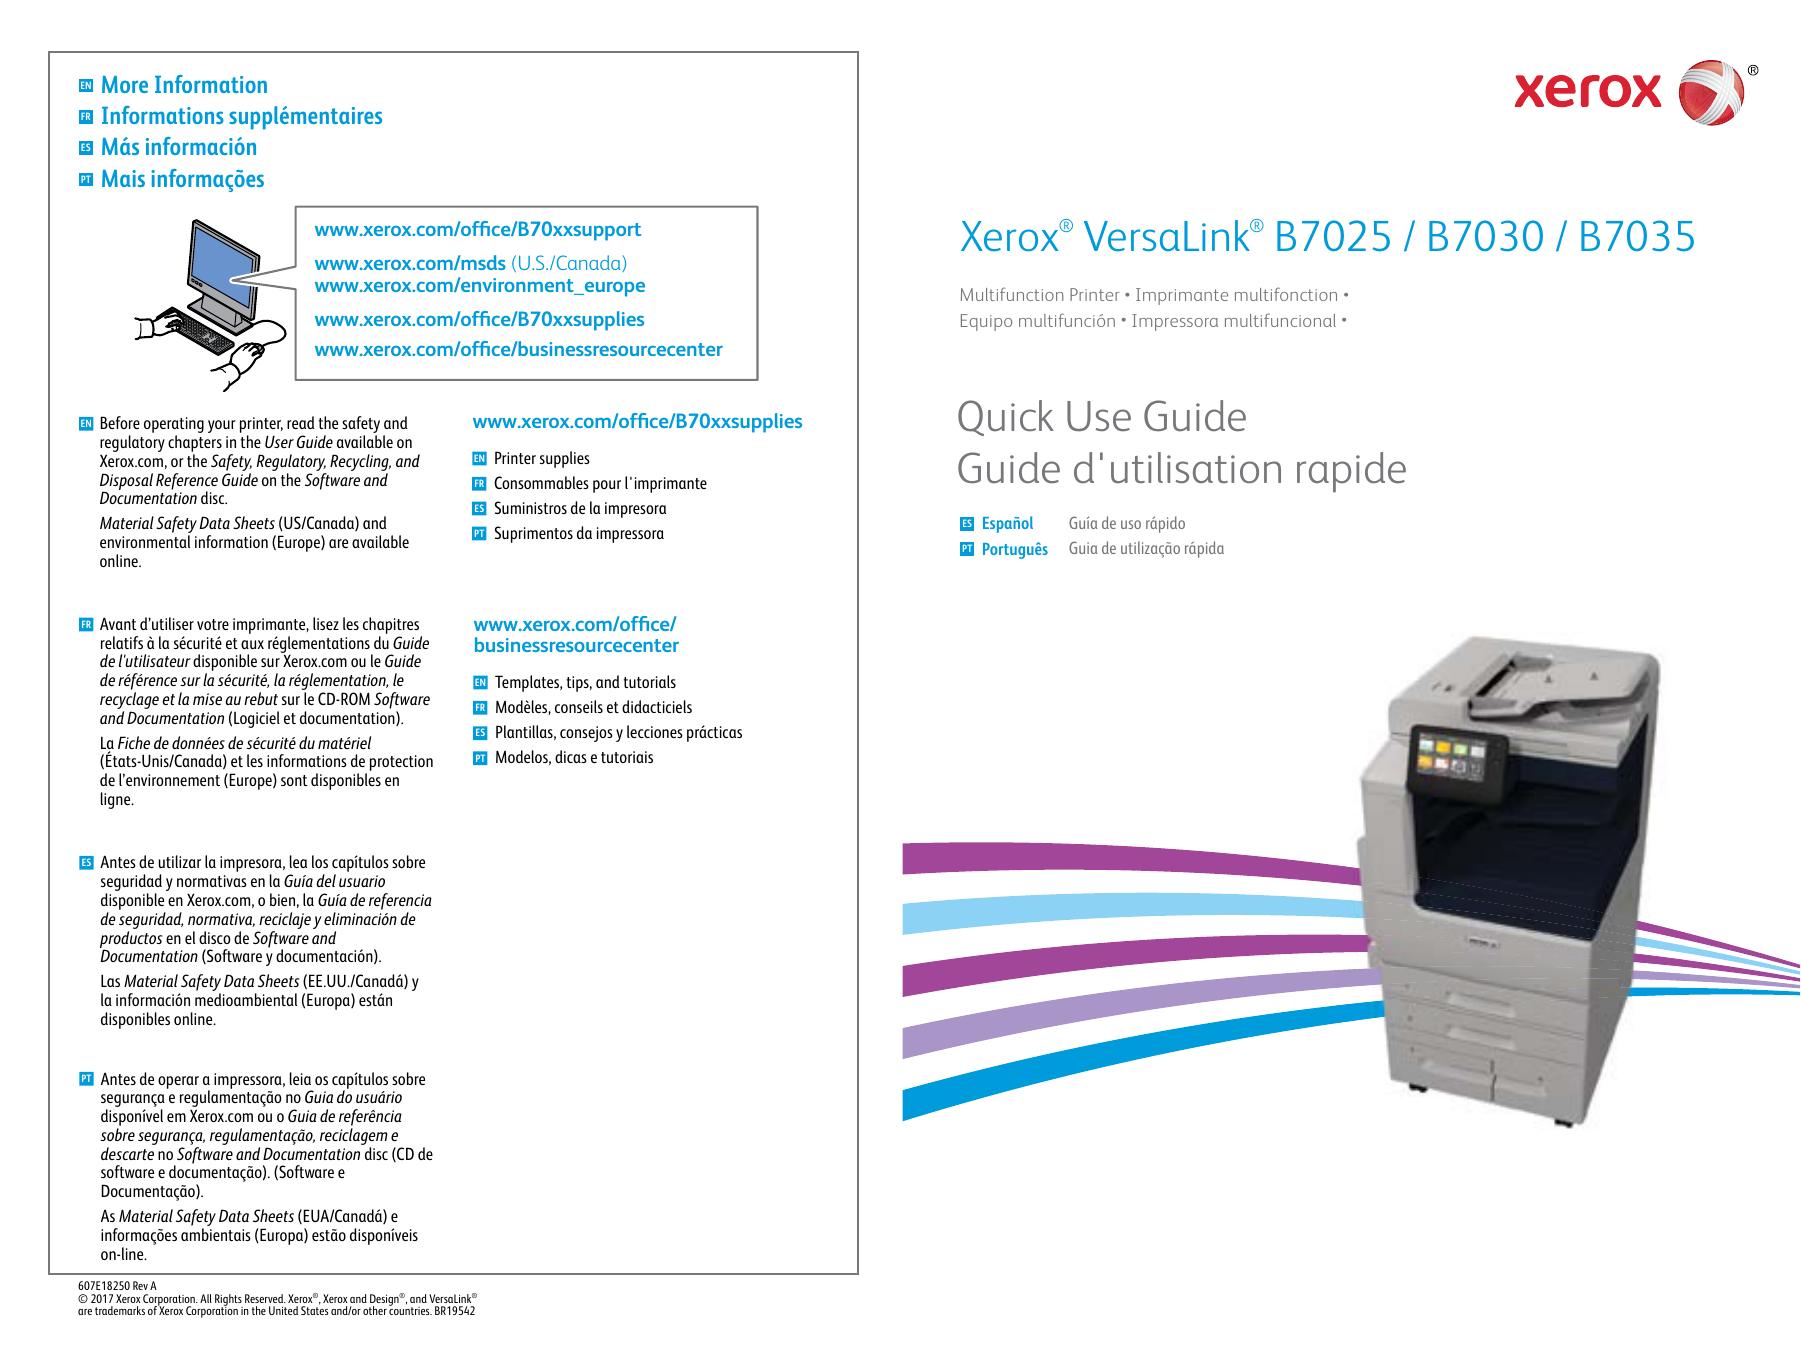 Xerox® VersaLink® B7025/B7030/B7035   manualzz com